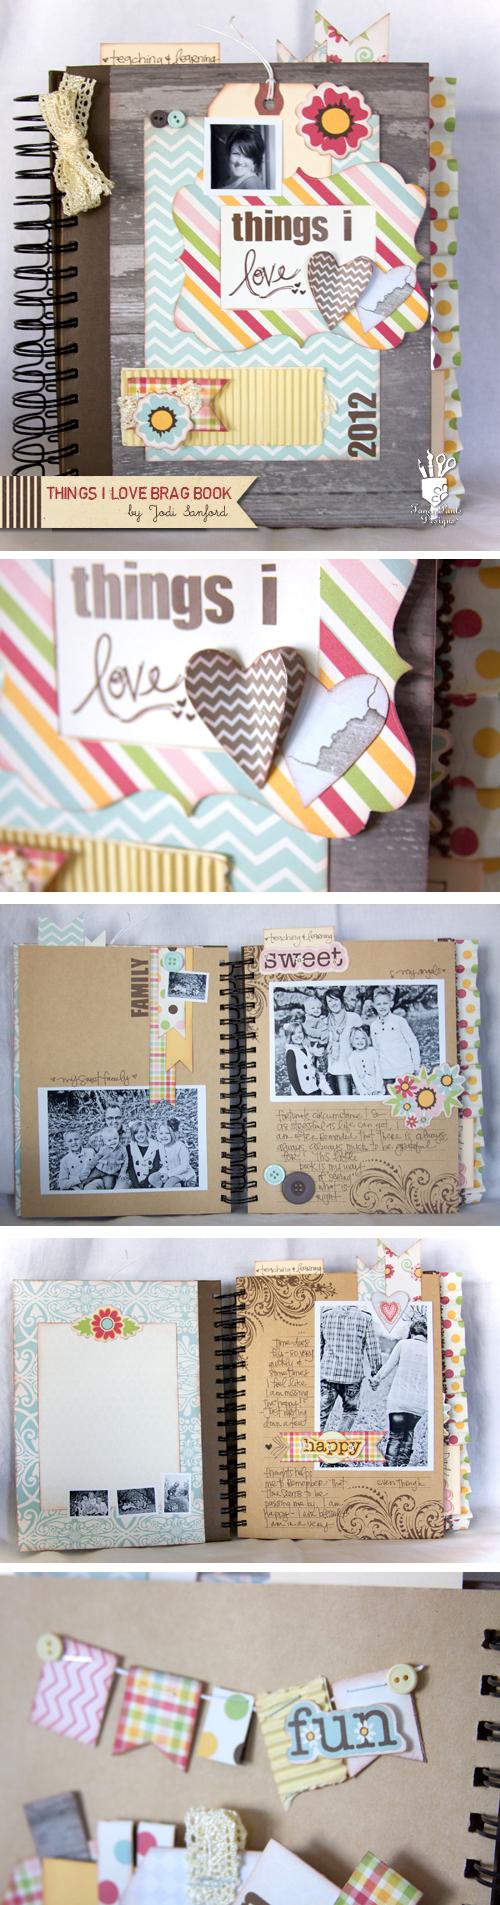 ThingsILoveBargBook_JodiSanford